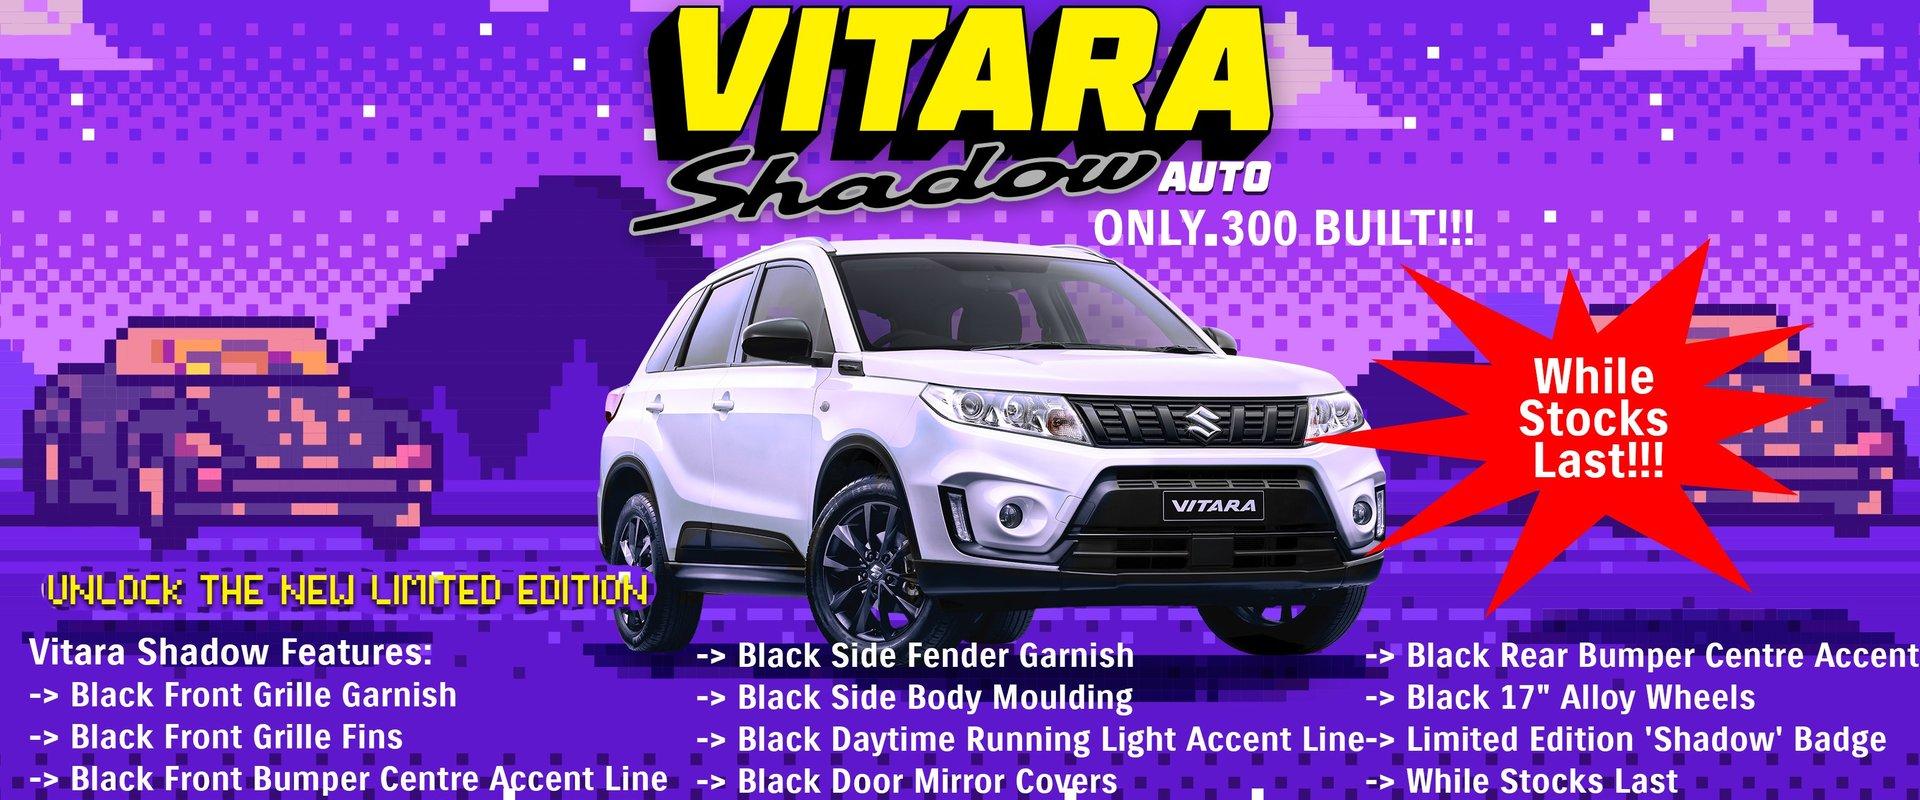 Vitara Shadow - Limited Edition